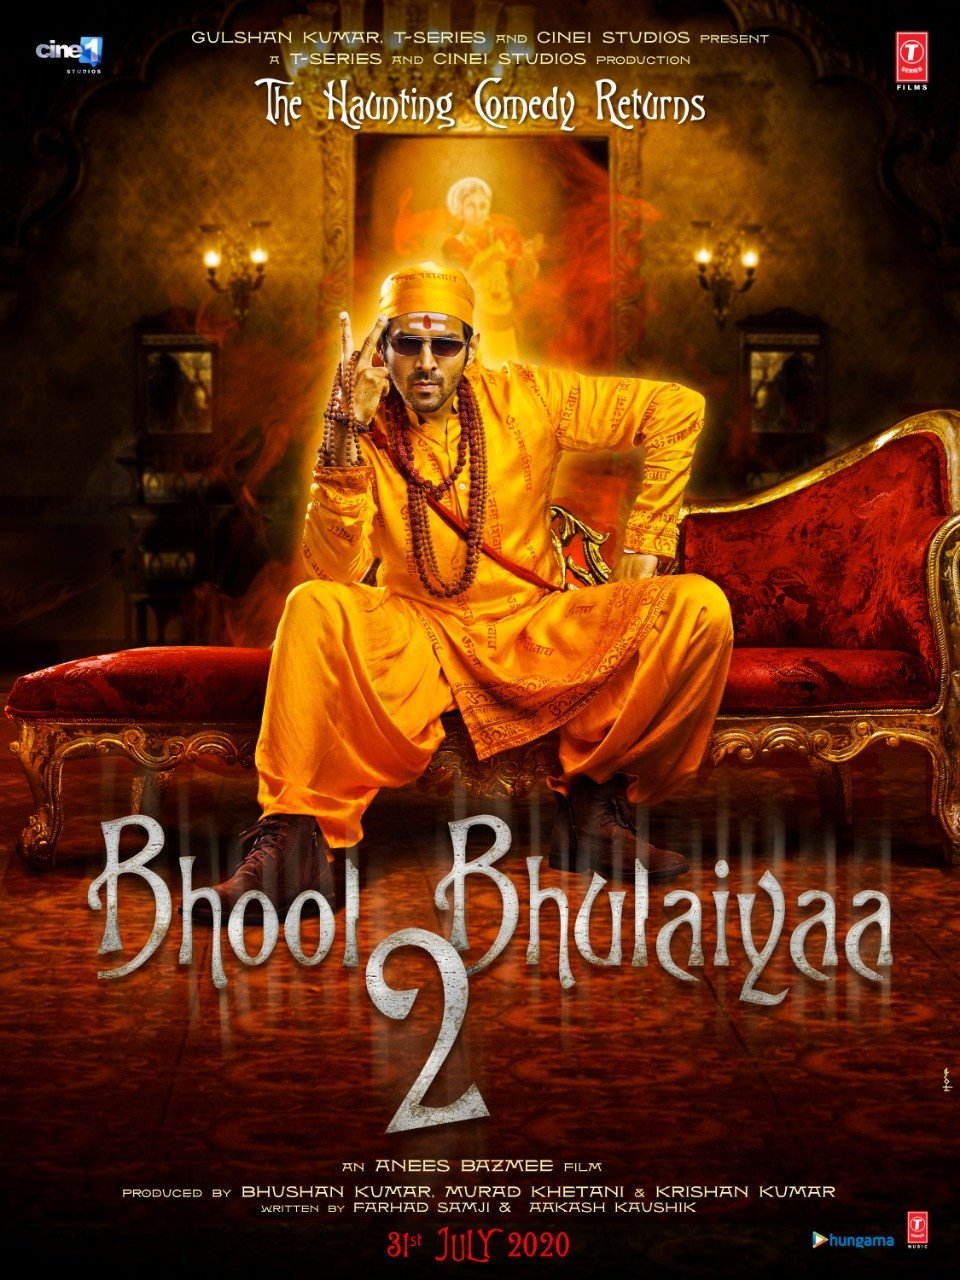 Murad Khetani, Anees Bazmee & Kartik Aaryan join Bhushan Kumar for the 'Bhool Bhulaiyaa' franchise